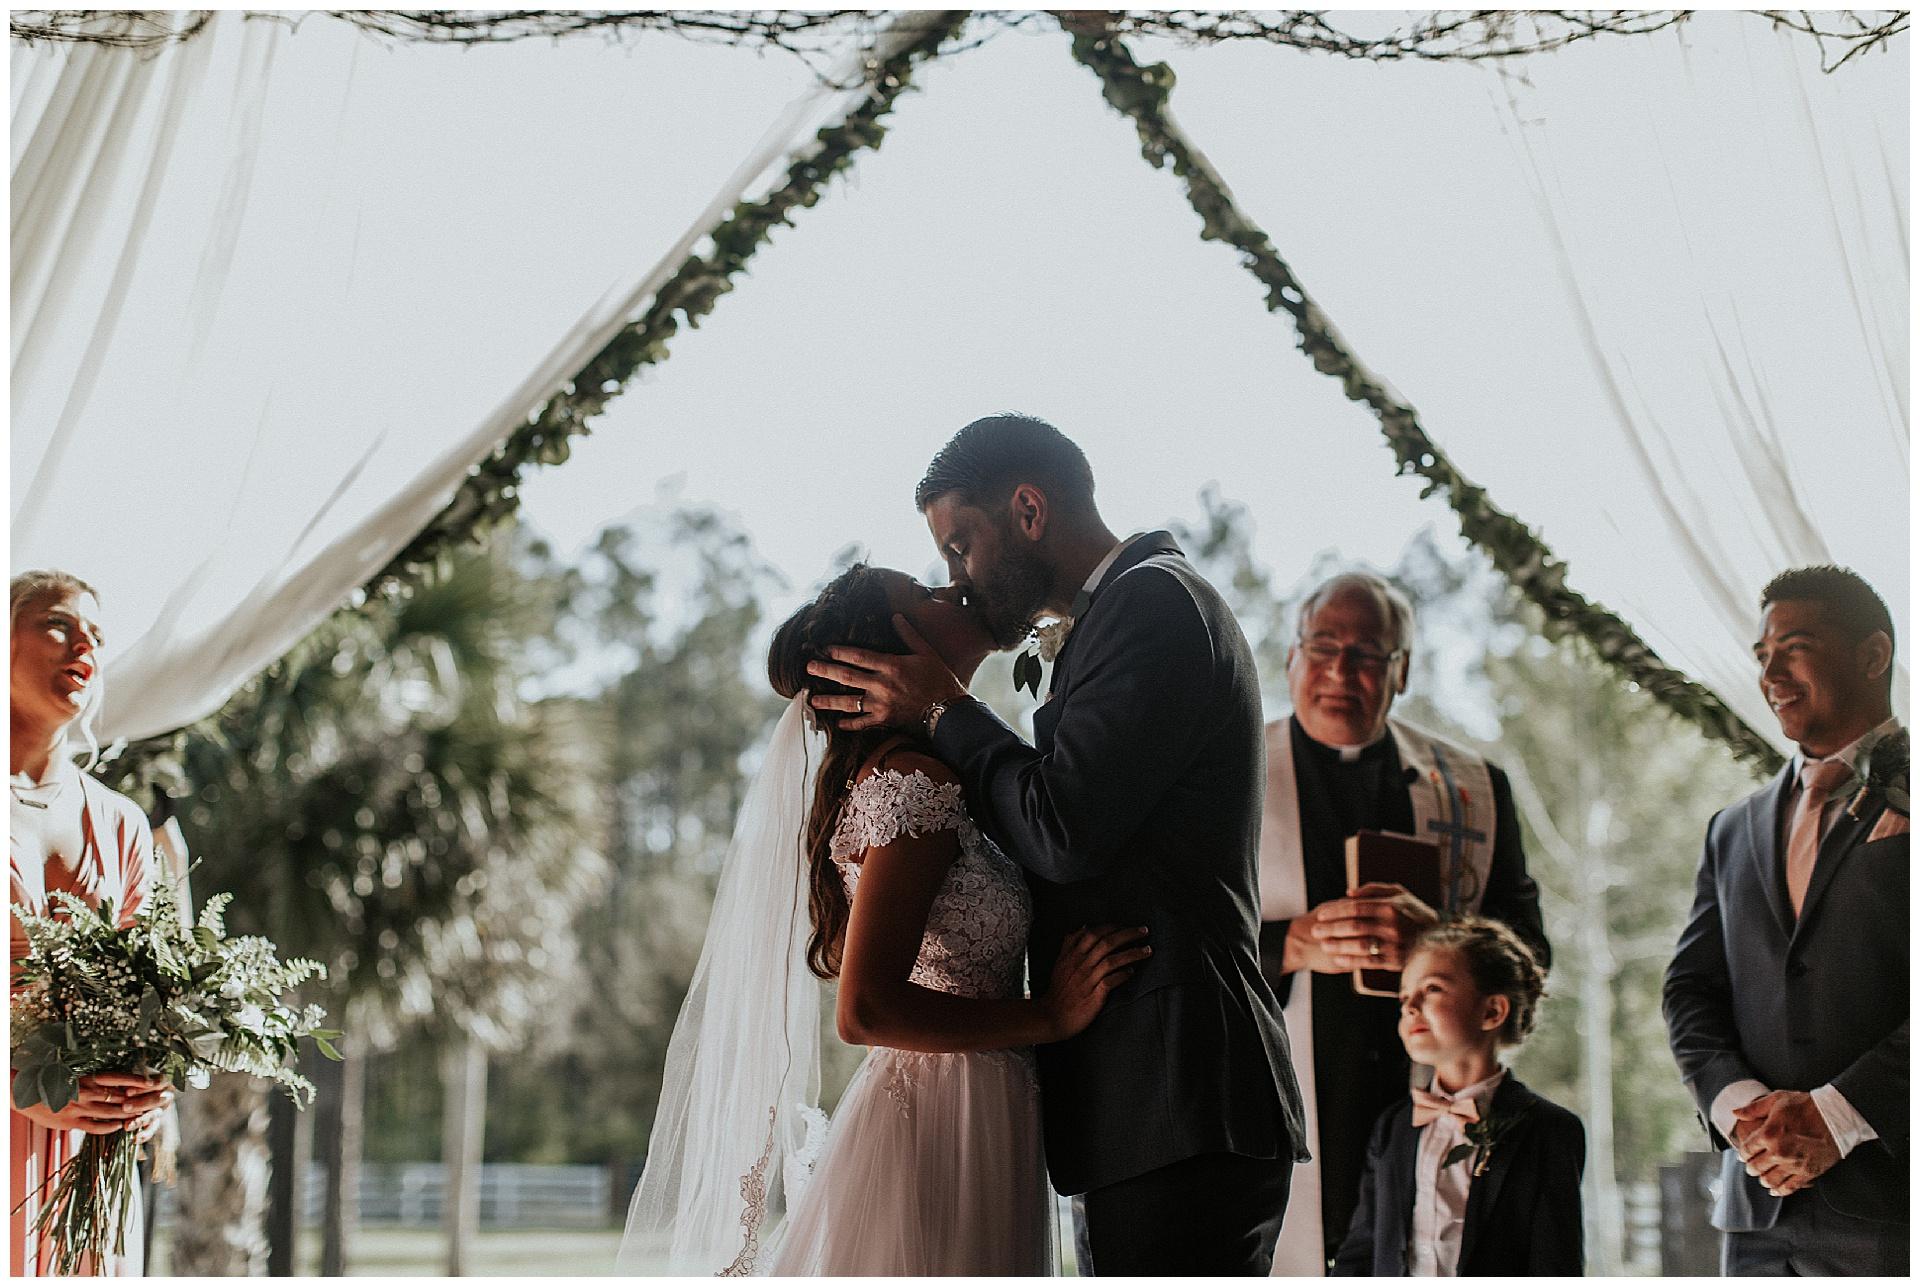 st augustine wedding photographer_mia dimare photography27.jpg